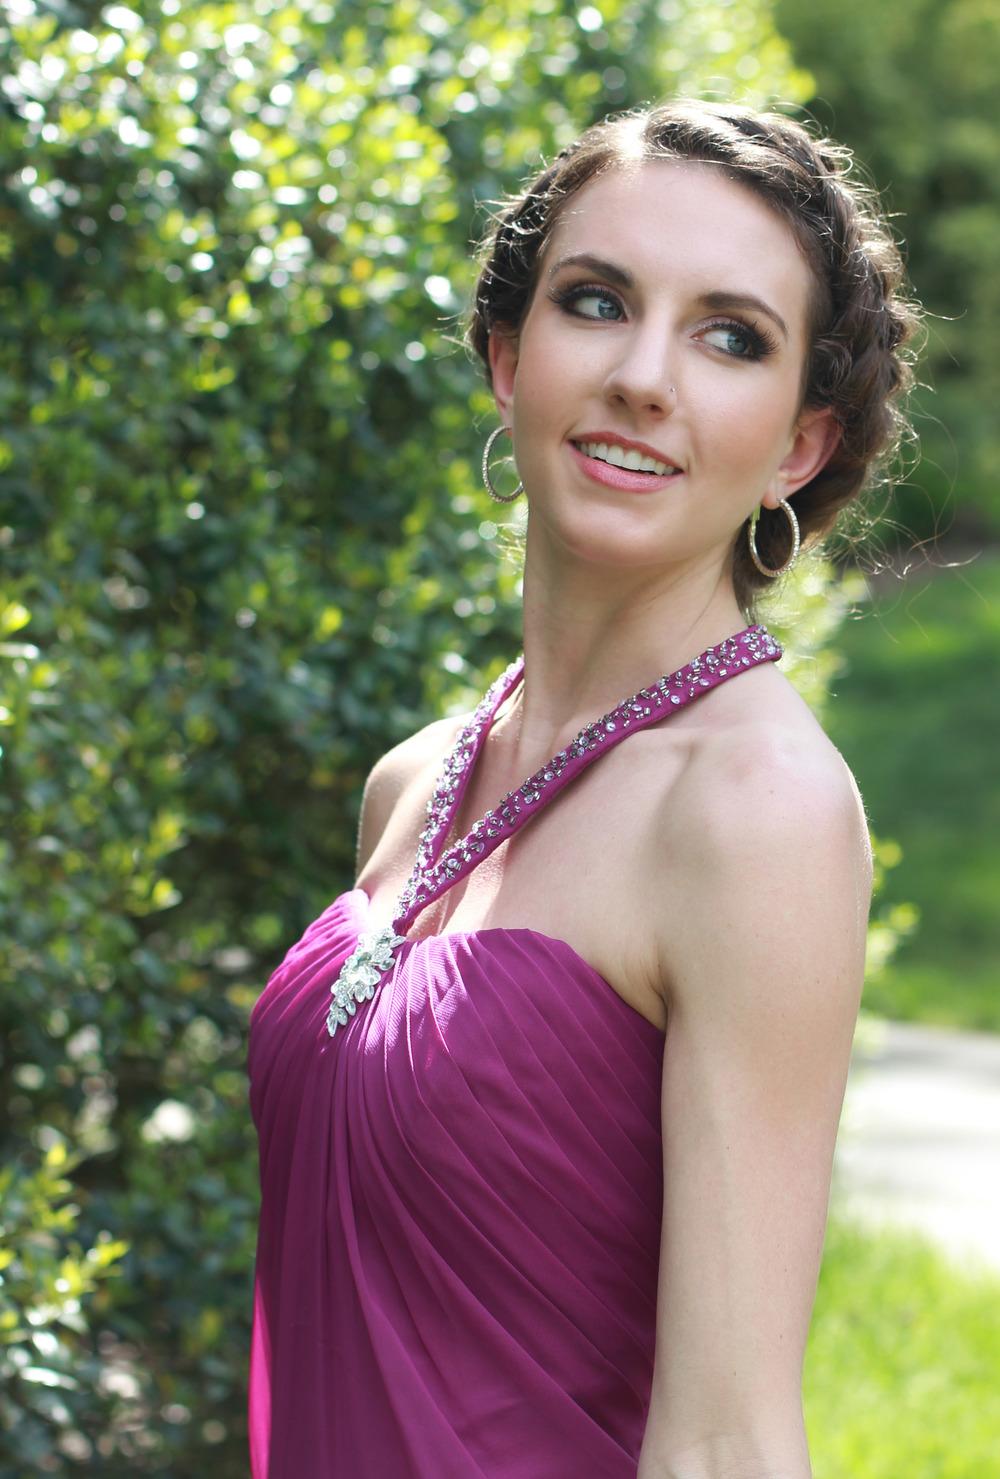 Bohemian Wedding | Bridesmaid | Brookeside Gardens - Jess Rudolph Photography: : www.jessrudolph.com